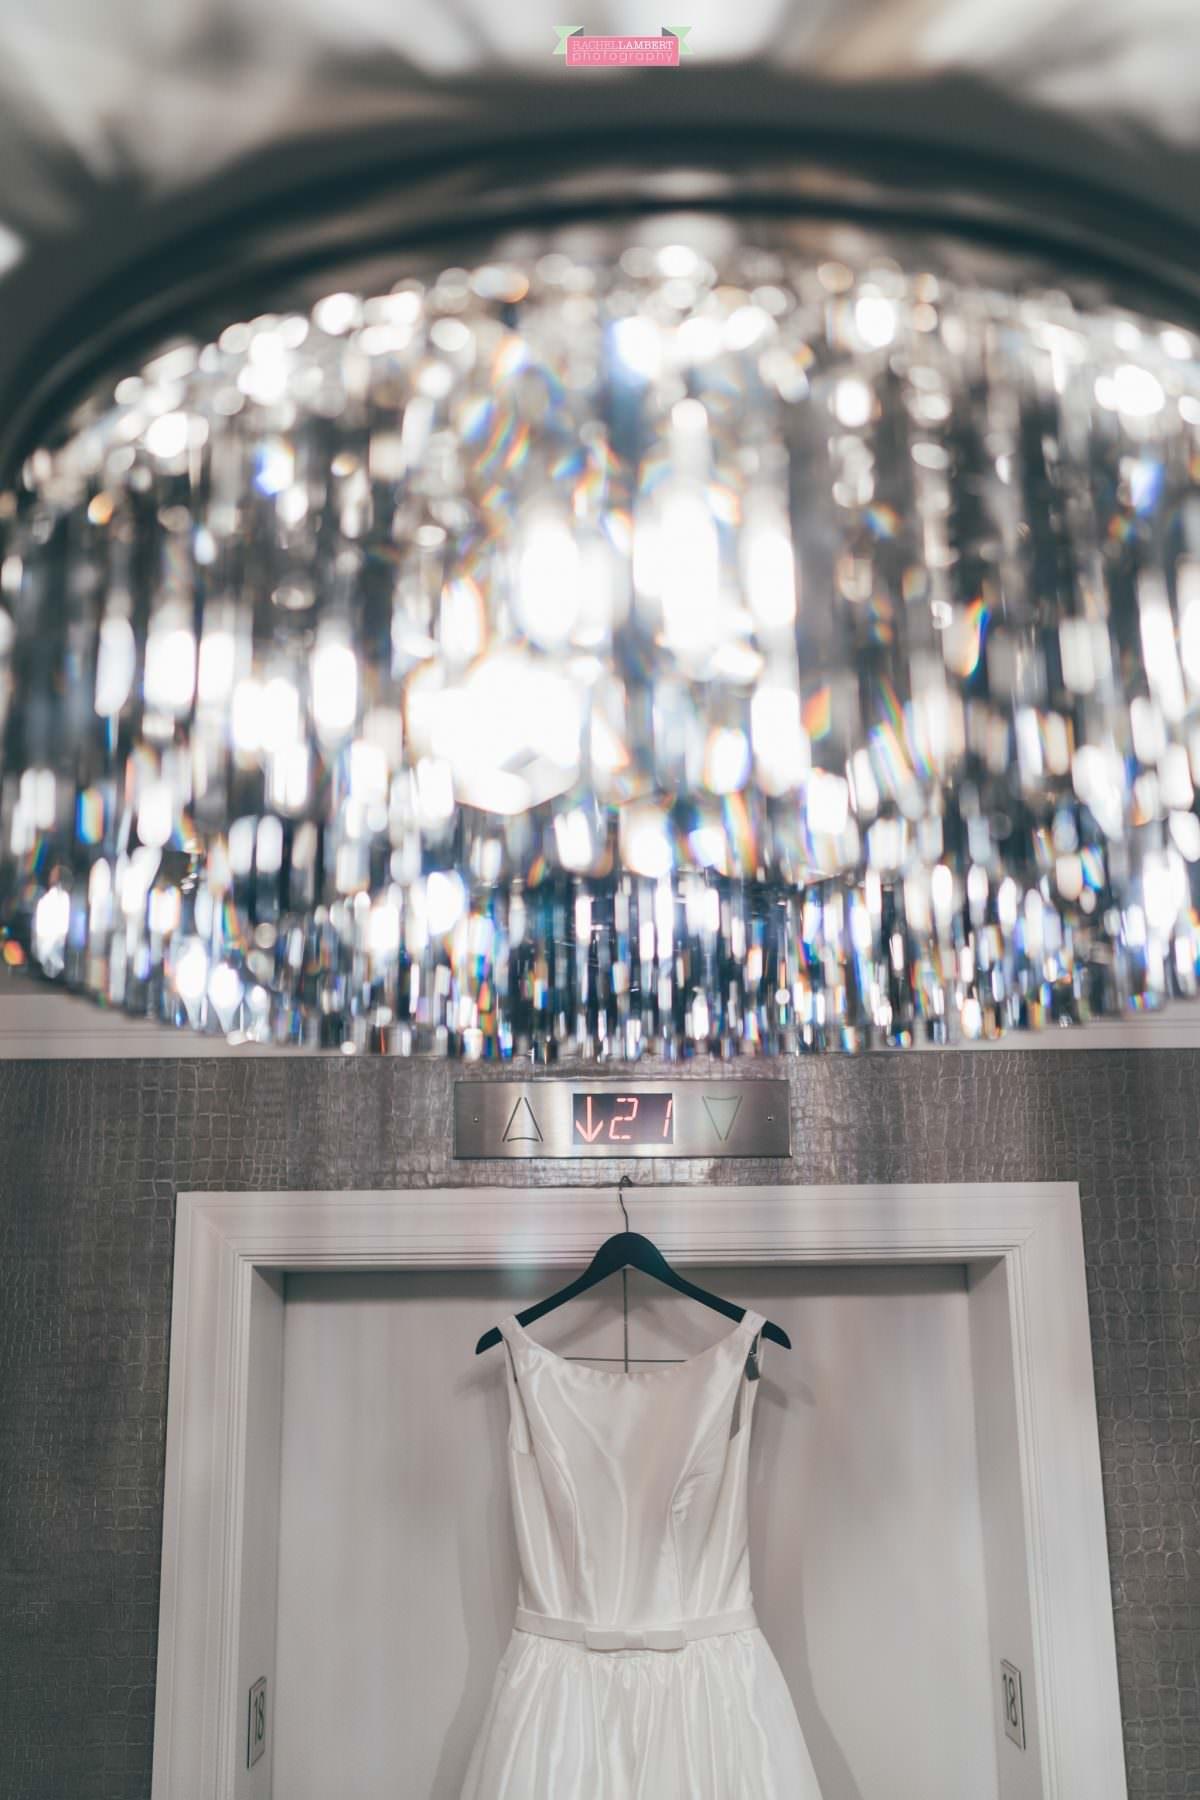 rachel lambert photography new york wedding photos the manhattan hotel time square justin alexander bridal gown